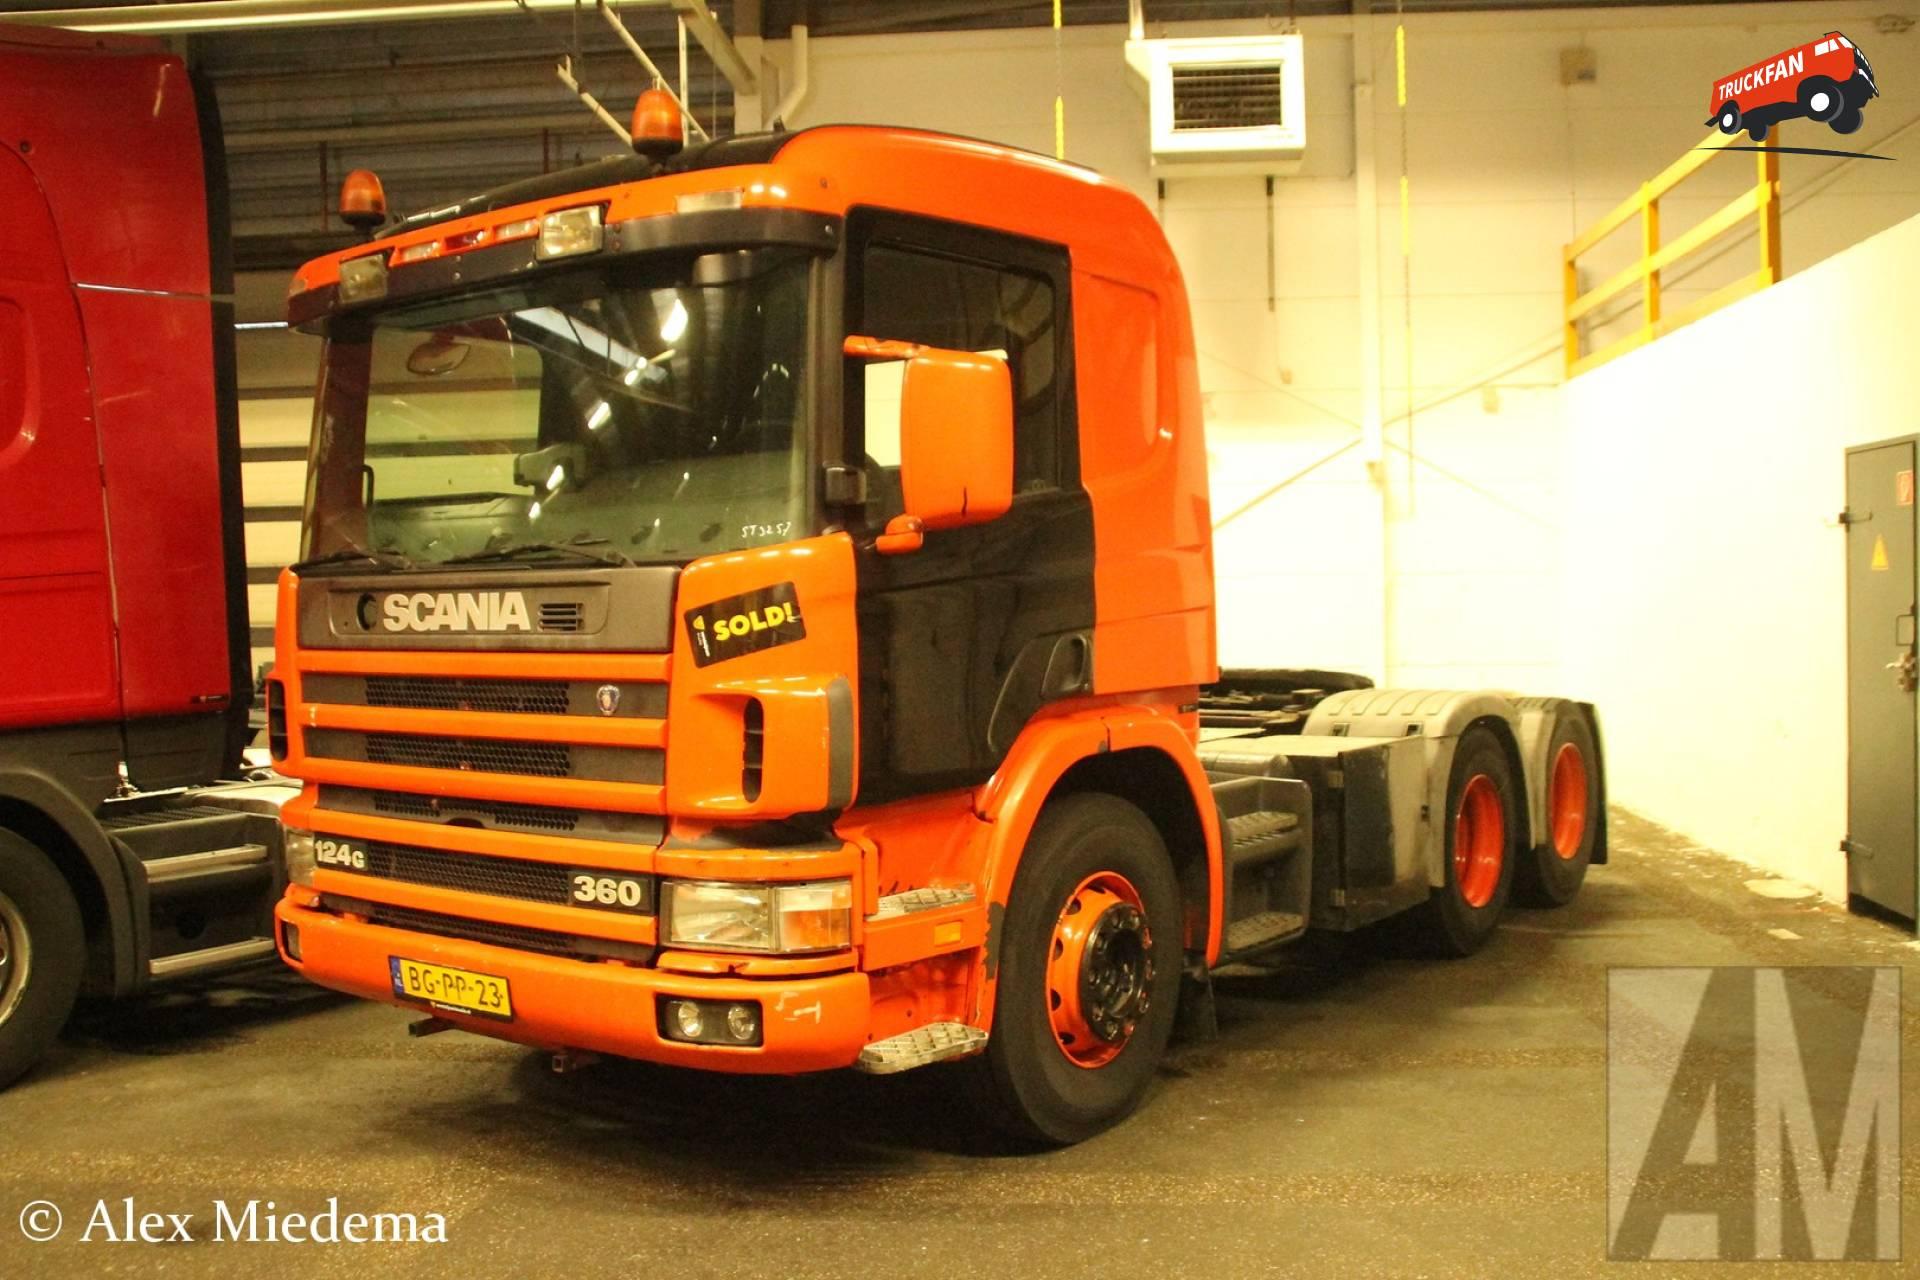 Scania-KIA 124